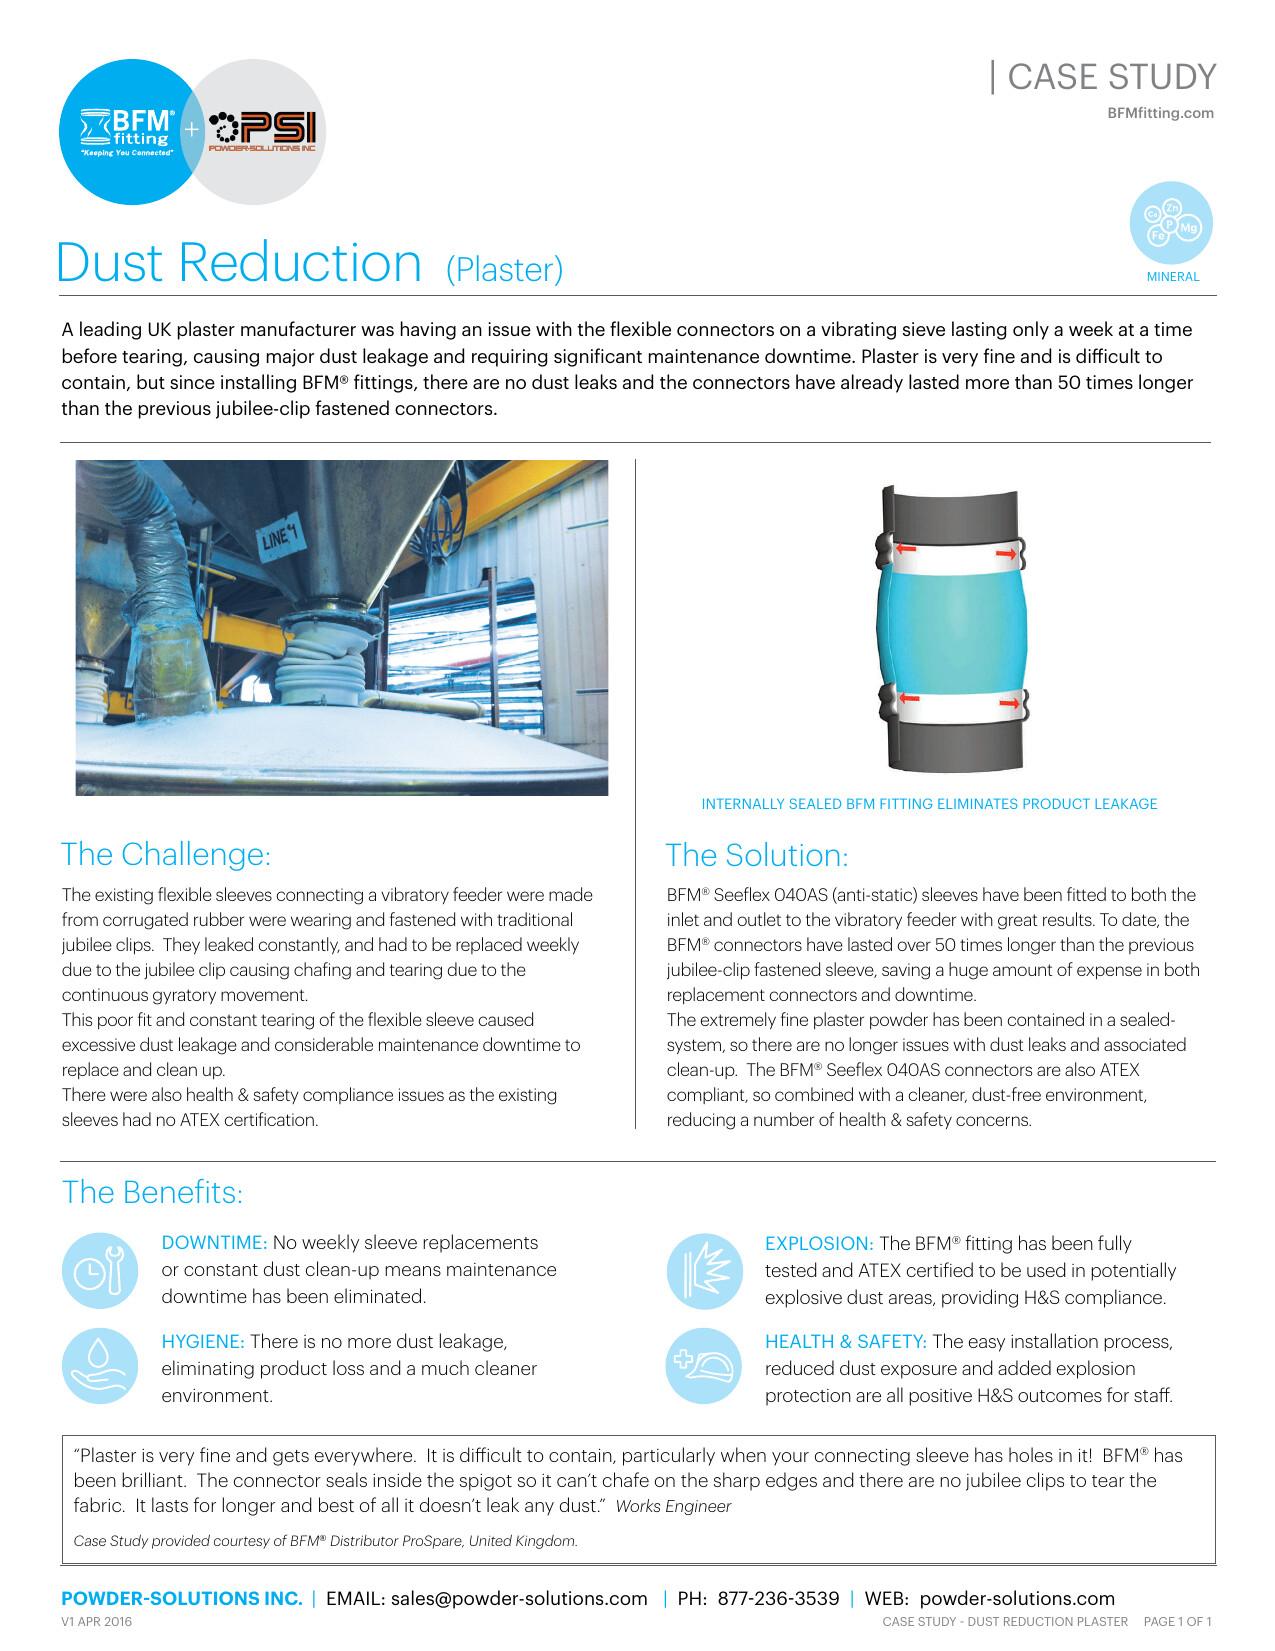 PSI BFM Case Study Dust Reduction (Plaster) V1 Apr 2016 MINERAL